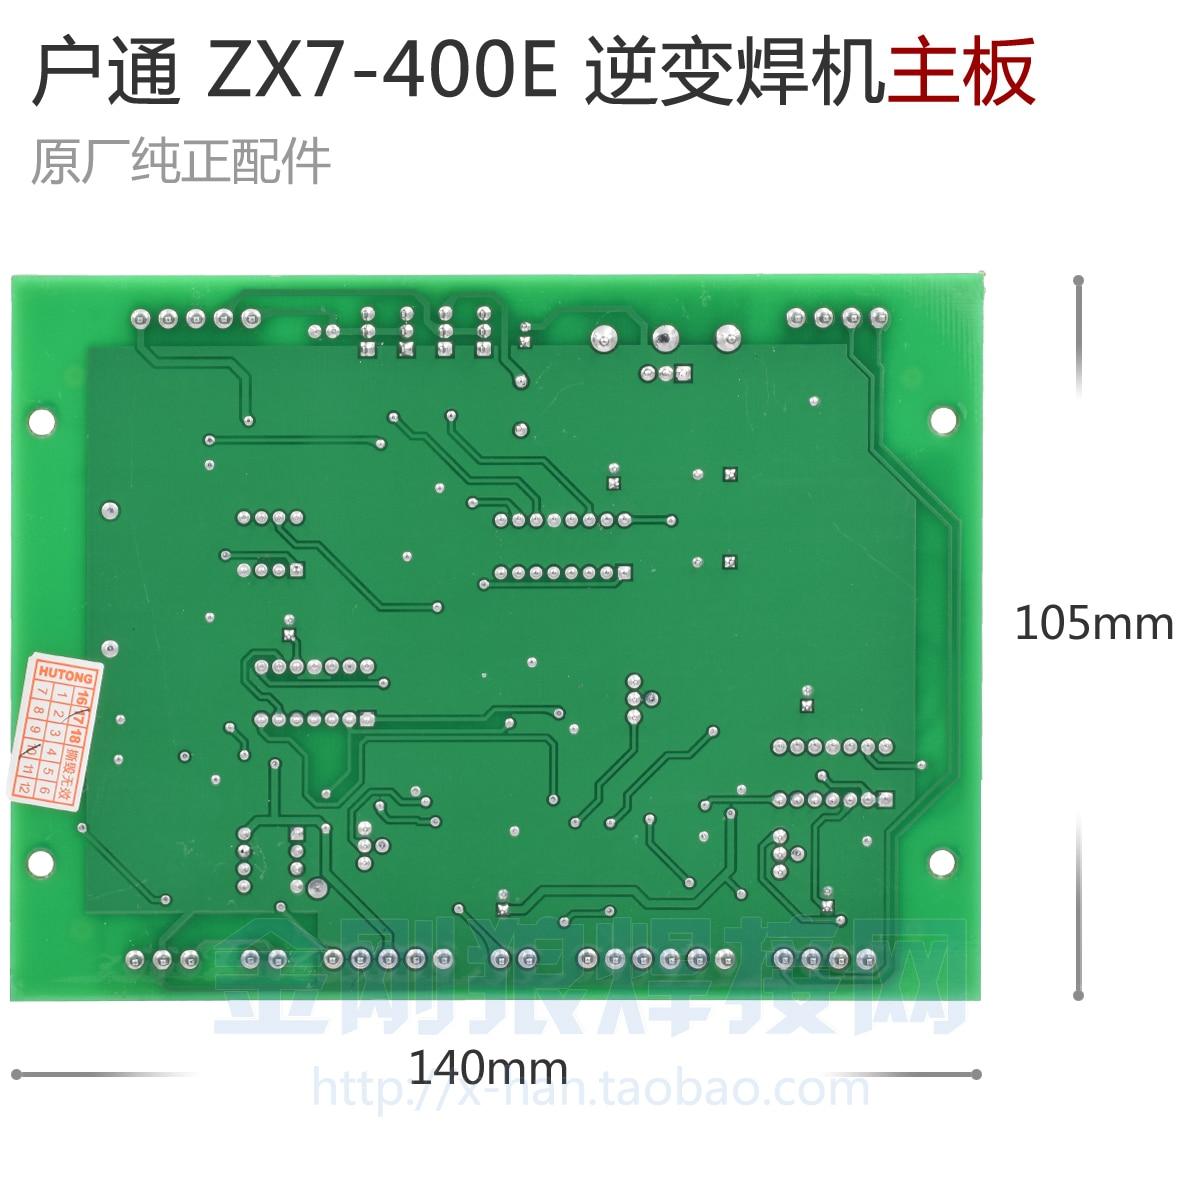 Aliexpress com : Buy YDT home ZX7 400E IGBT inverter welding machine  mainboard control board circuit board fittings from Reliable Arc Welders